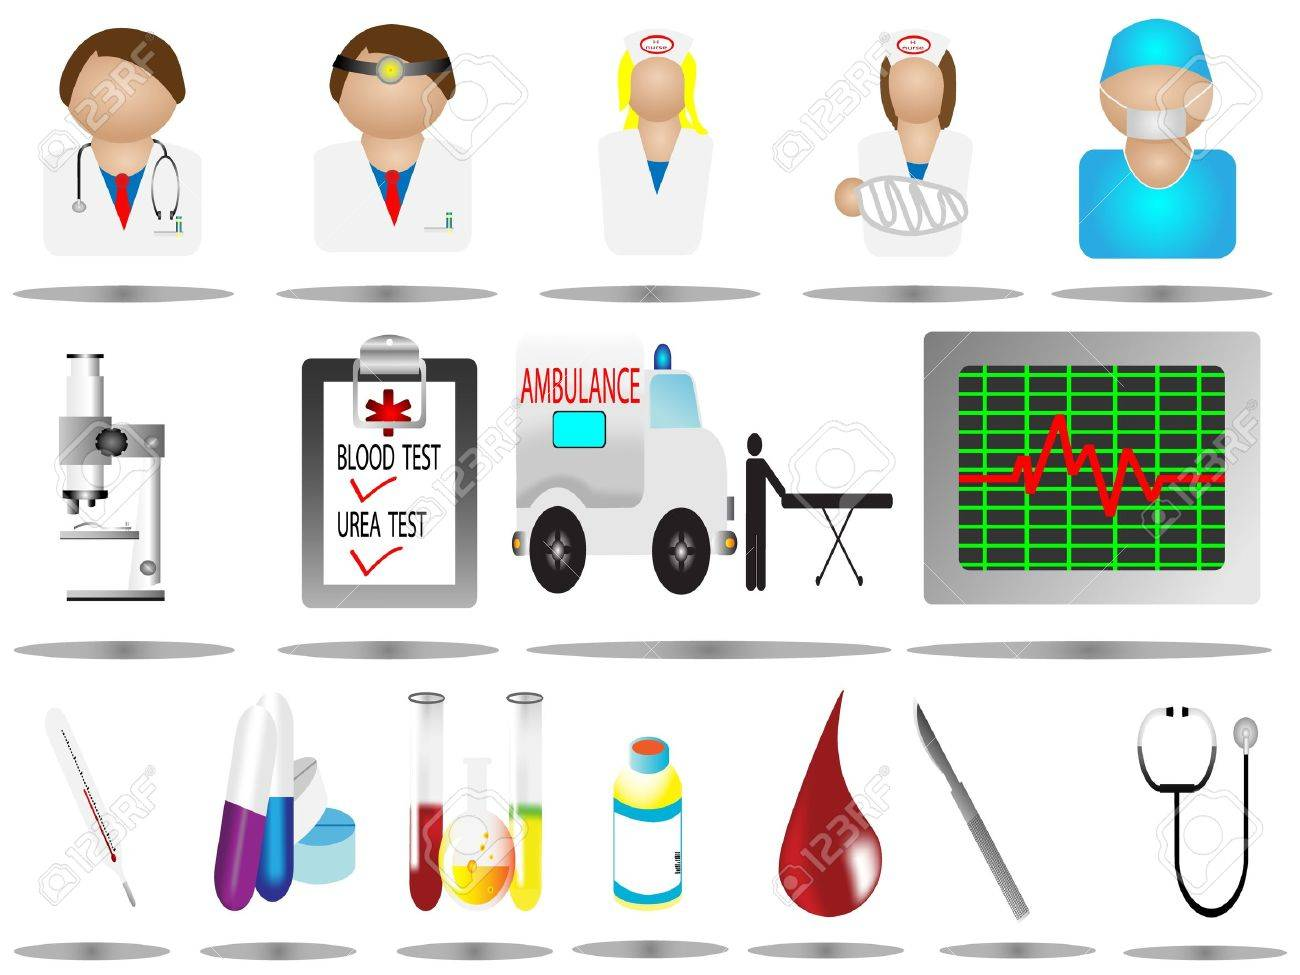 vector illustration hospital icons, hospital and medical icons set,Medical and Hospital Centre icons,easy to edit,microscope icon,nurse icon,doctor icon, Stock Vector - 9323179